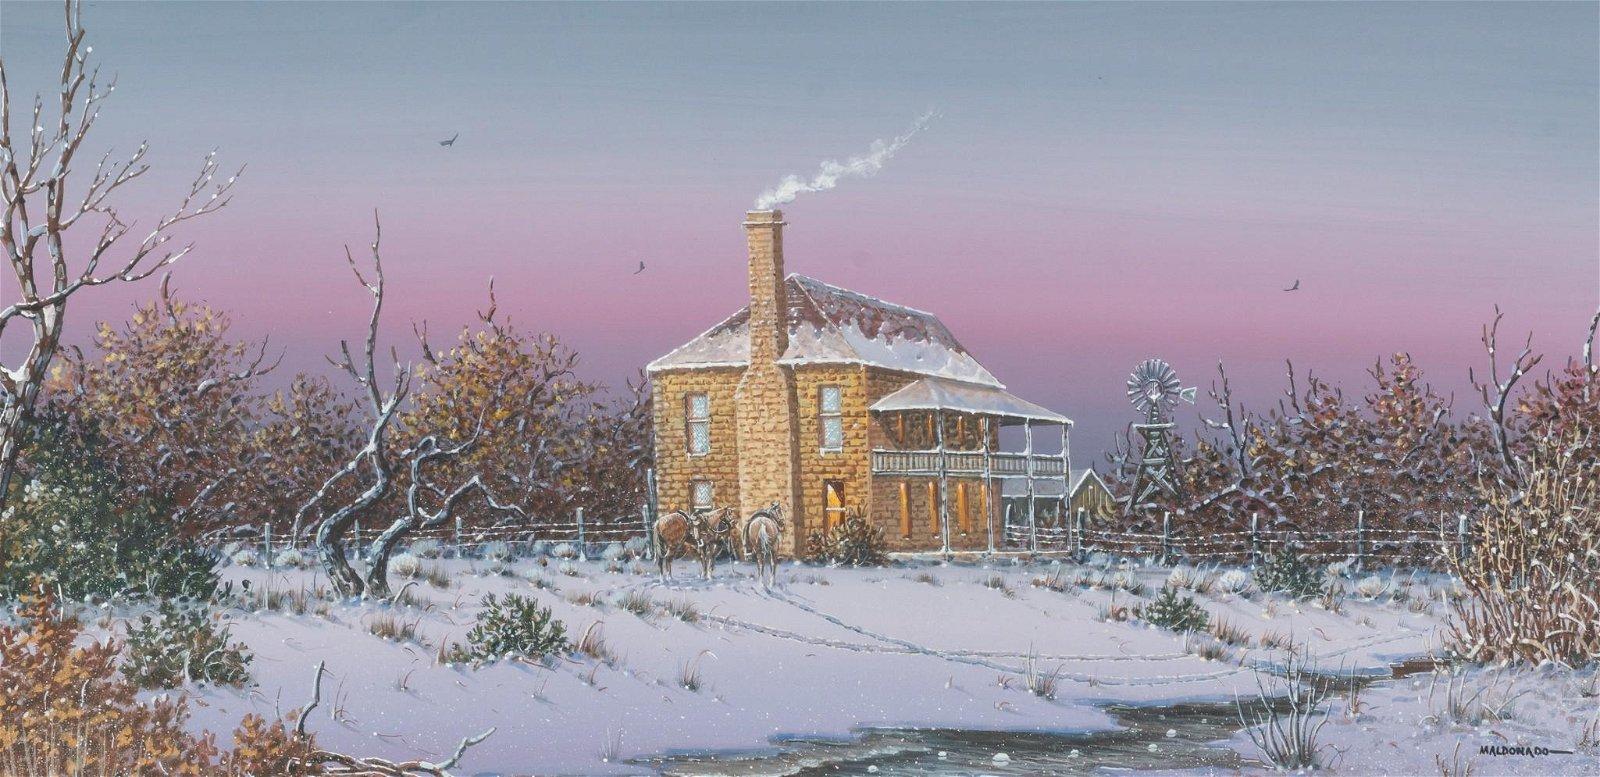 Daniel Maldonado (d. 2019), Snowy Cabin, watercolor,